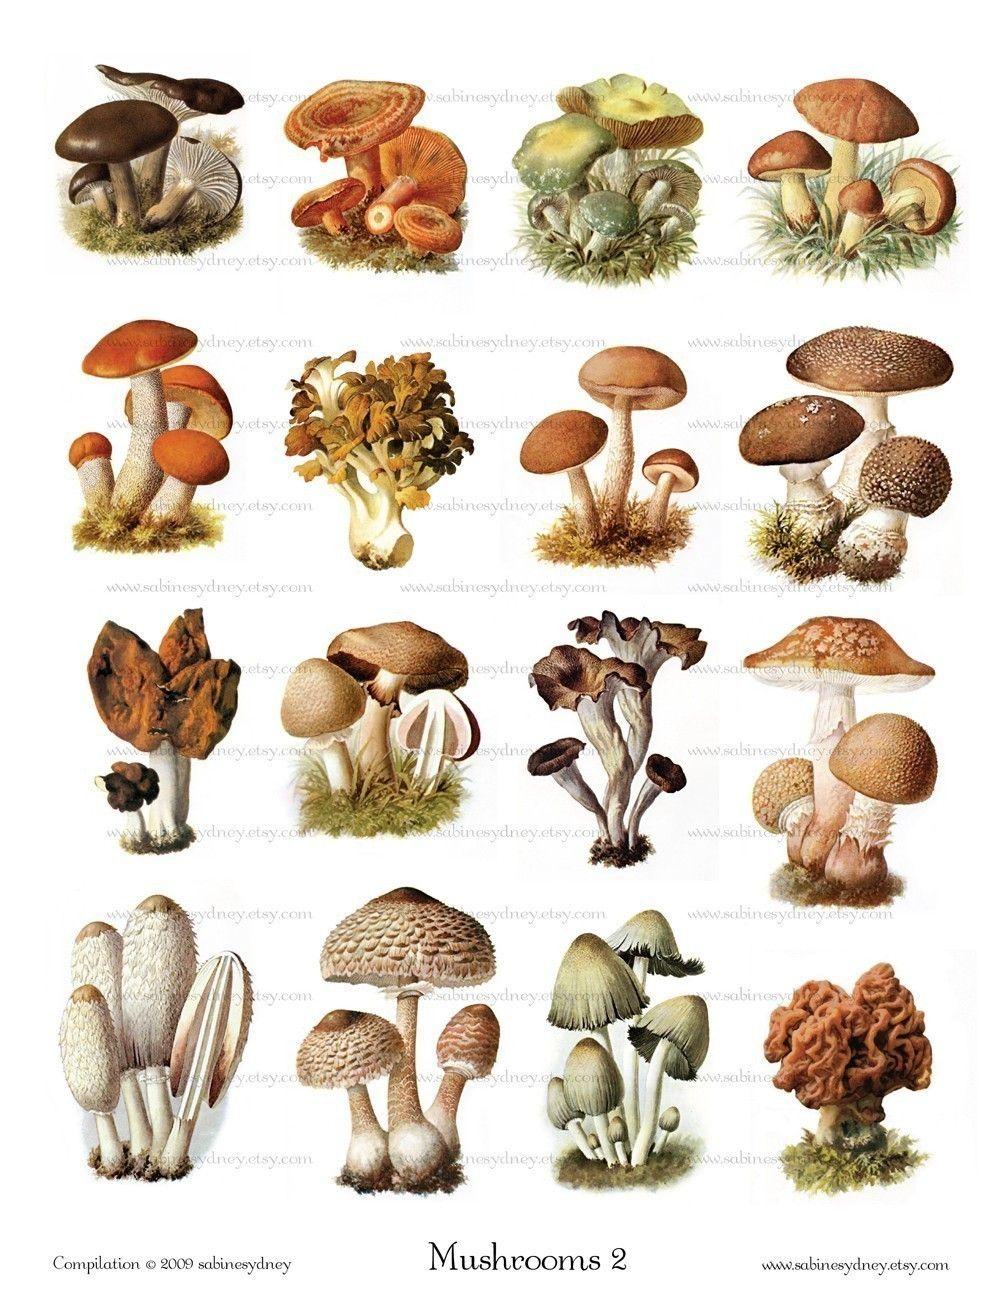 how to draw a mushroom - Google Search | Mushrooms ...